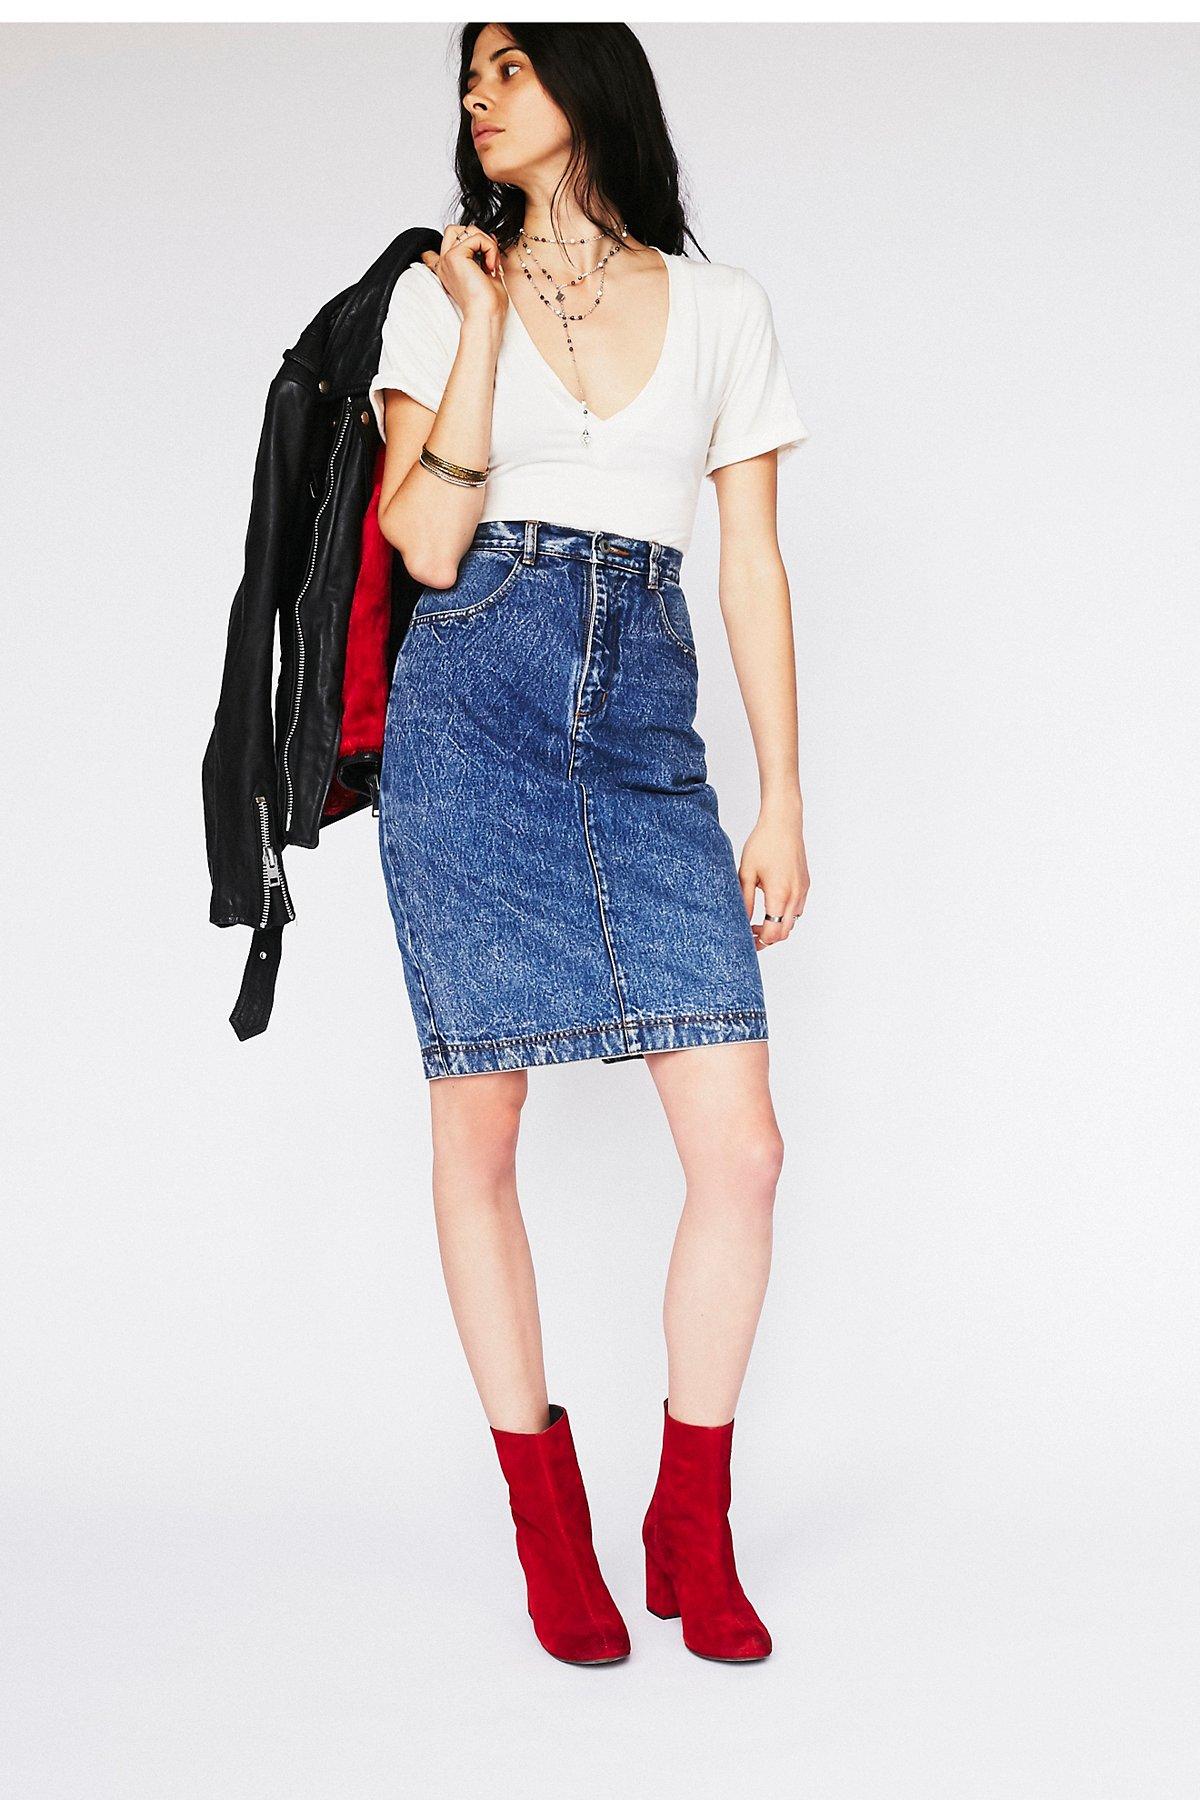 Vintage 1980s Denim Skirt